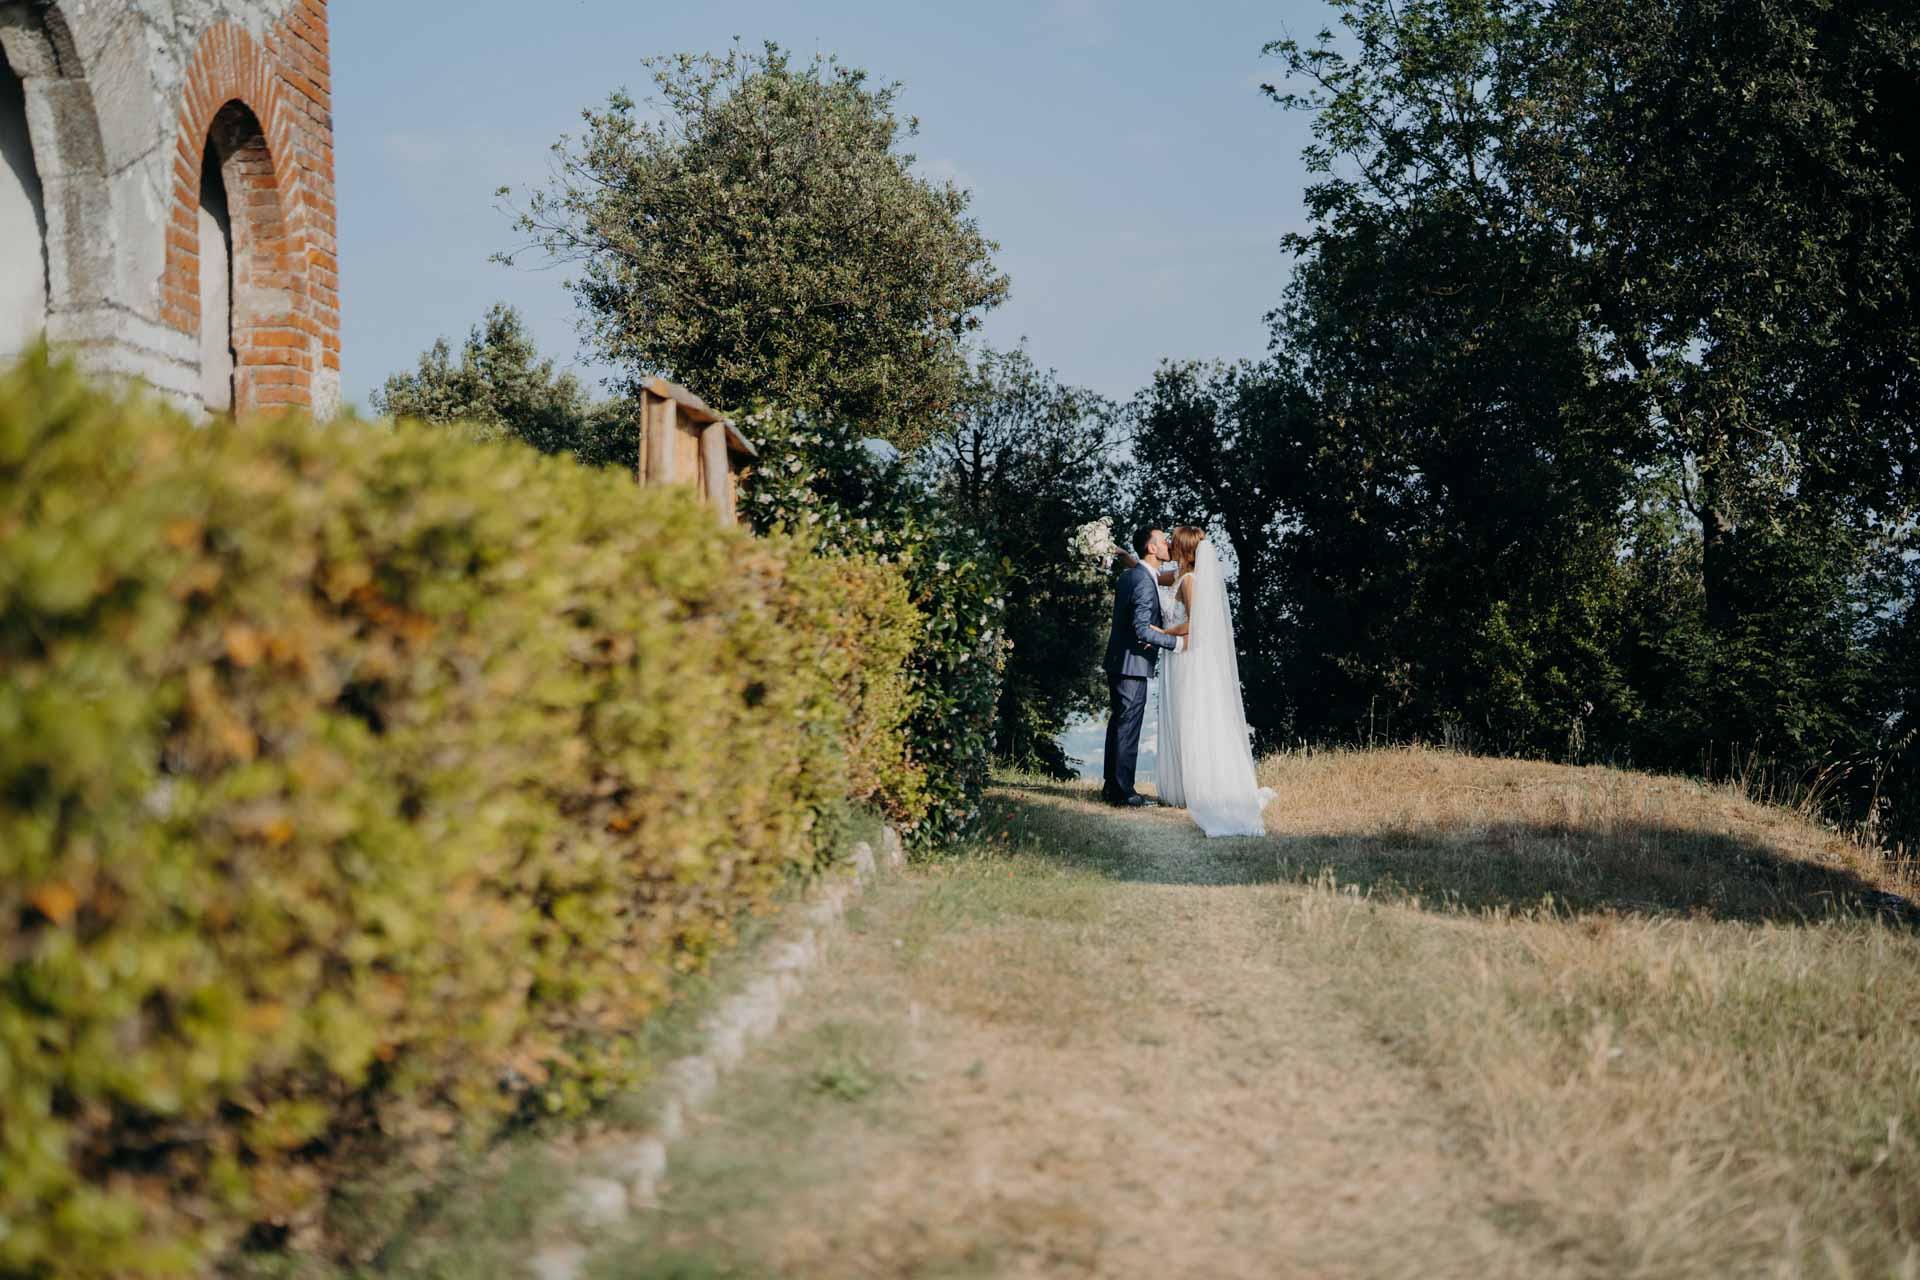 fotografo_matrimonio_toscana_poggio_tondo_61